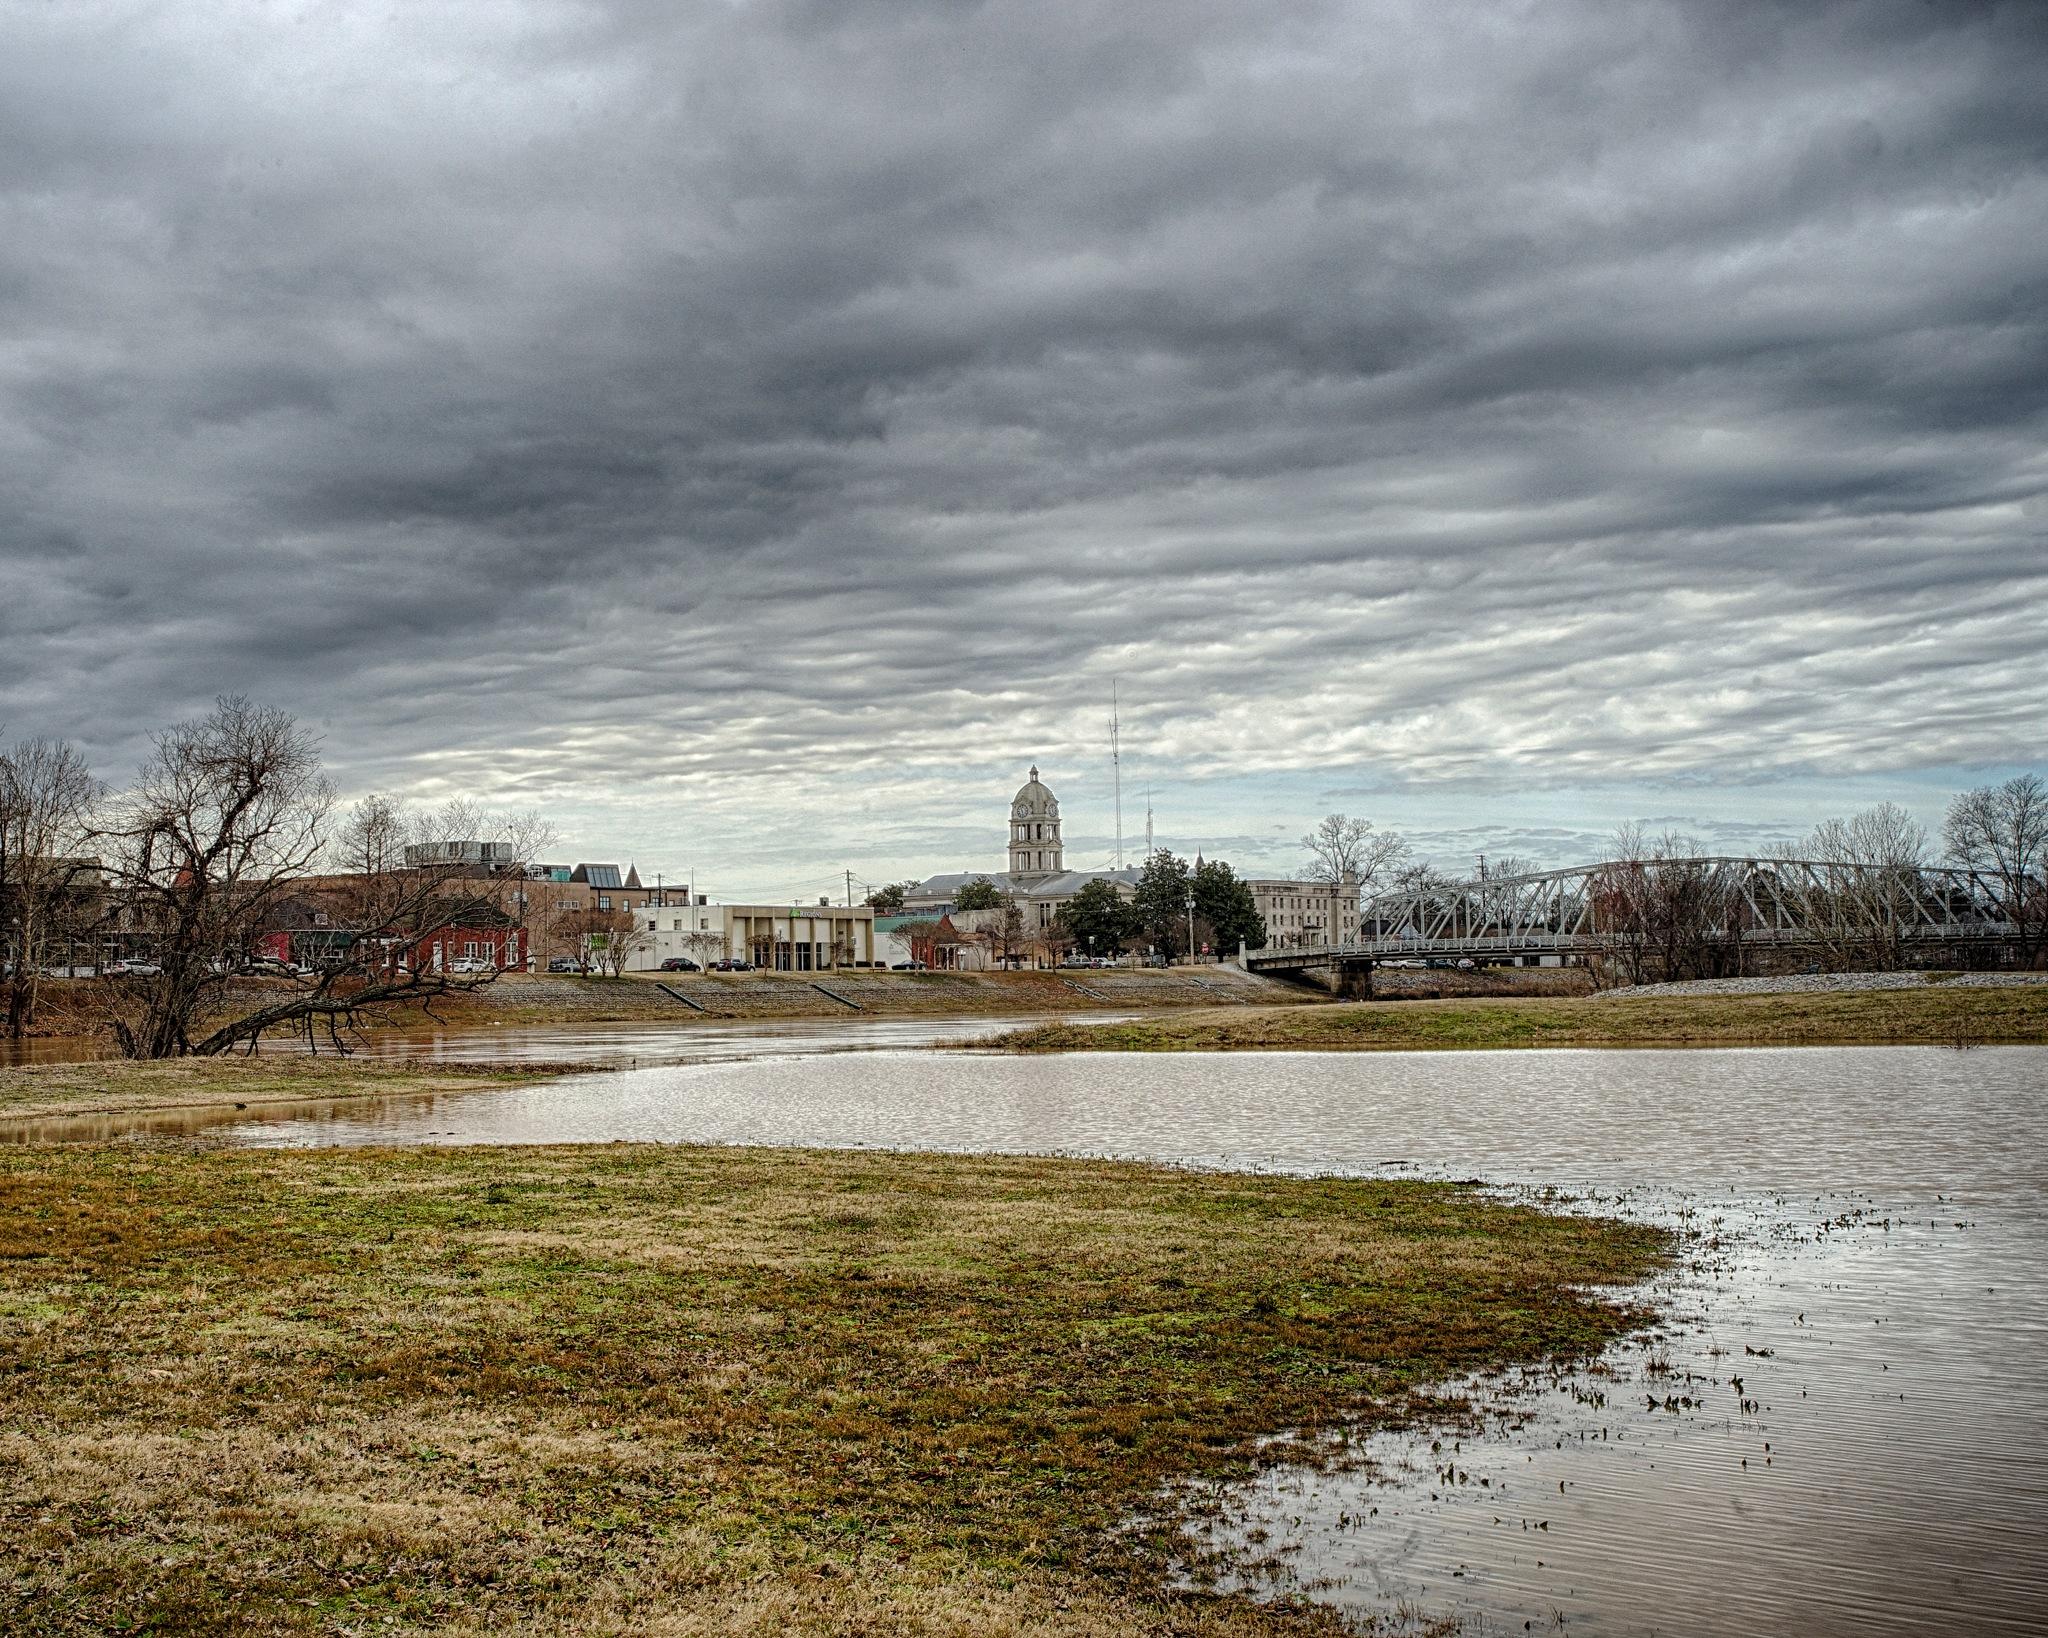 Riverfront Storm Brewing by Joe Seawright